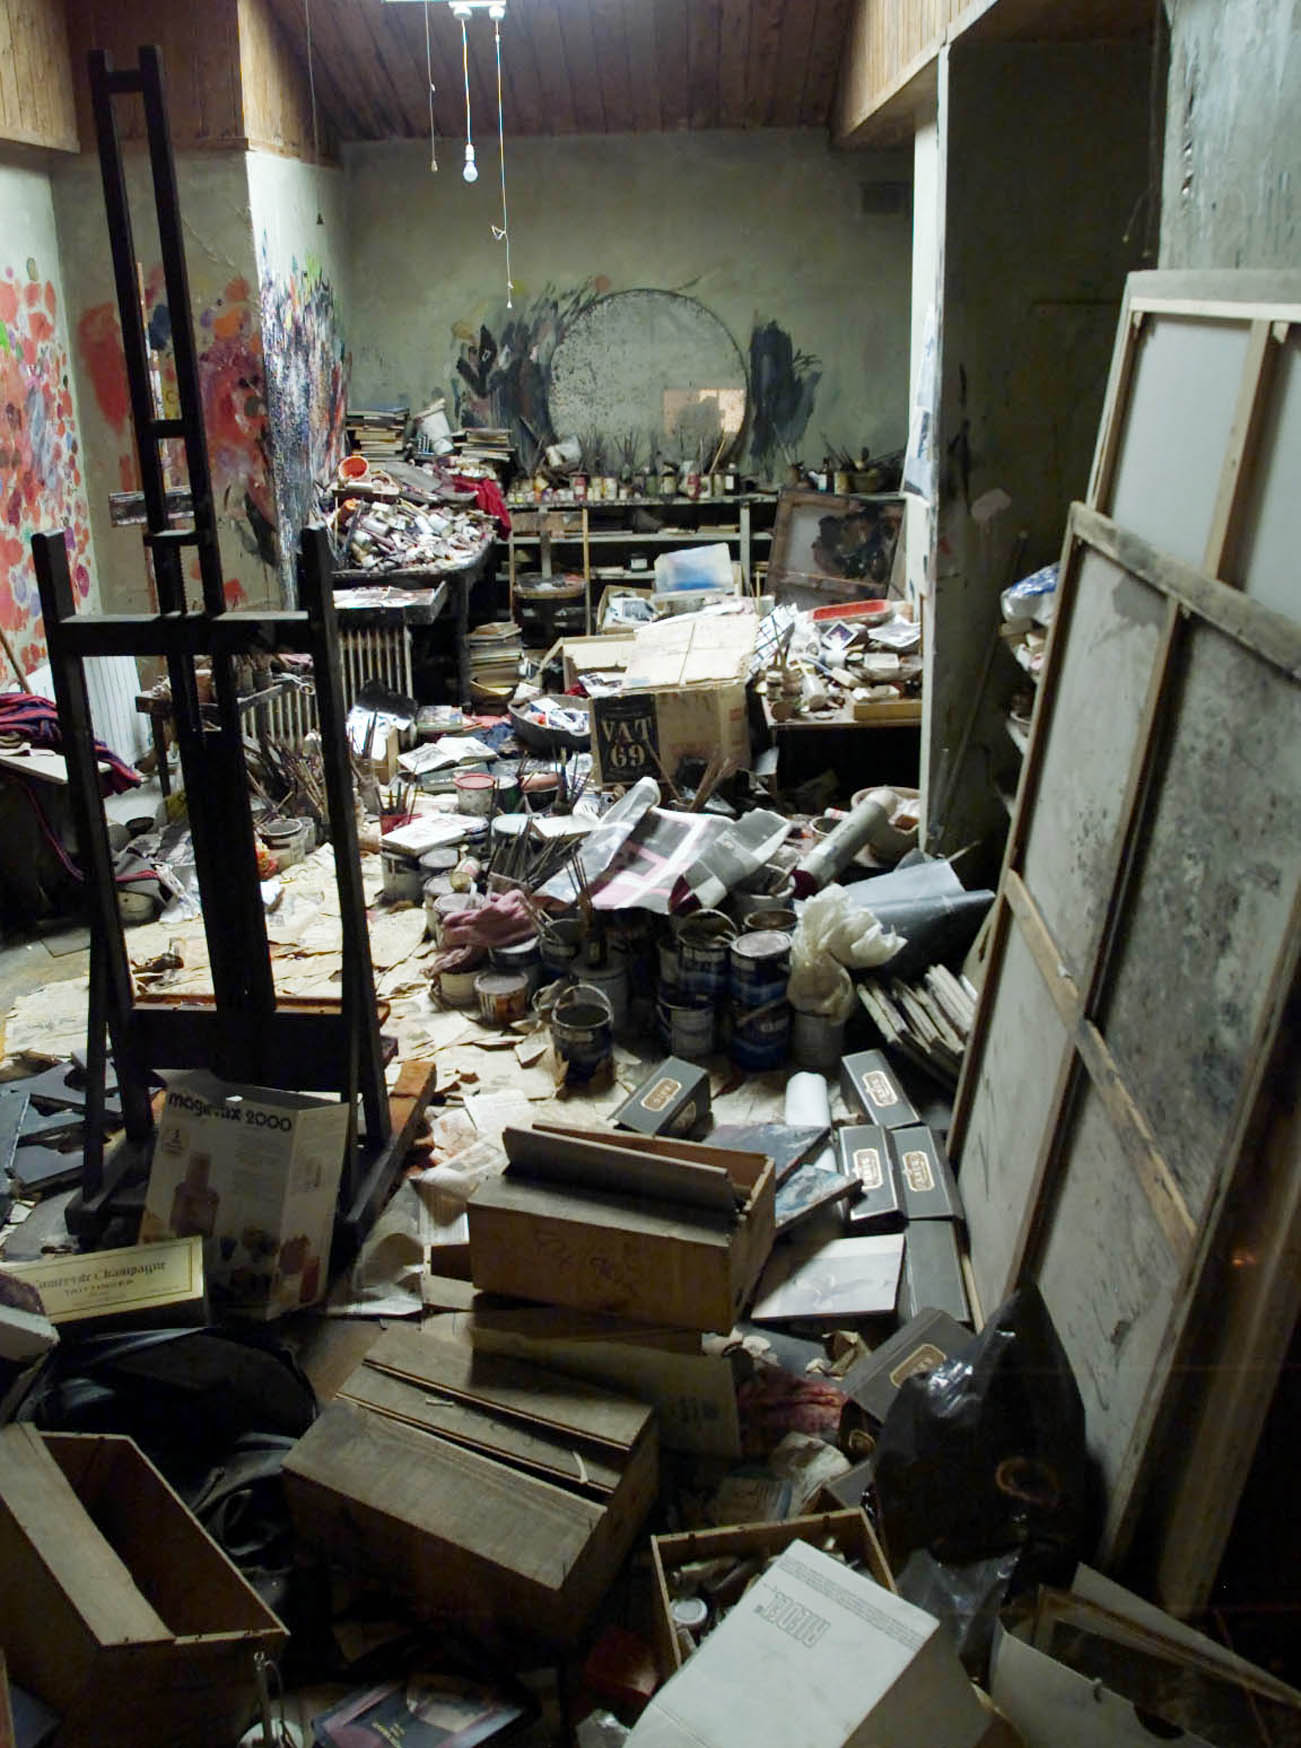 Hugh Lane Gallery.  Chris Bacon